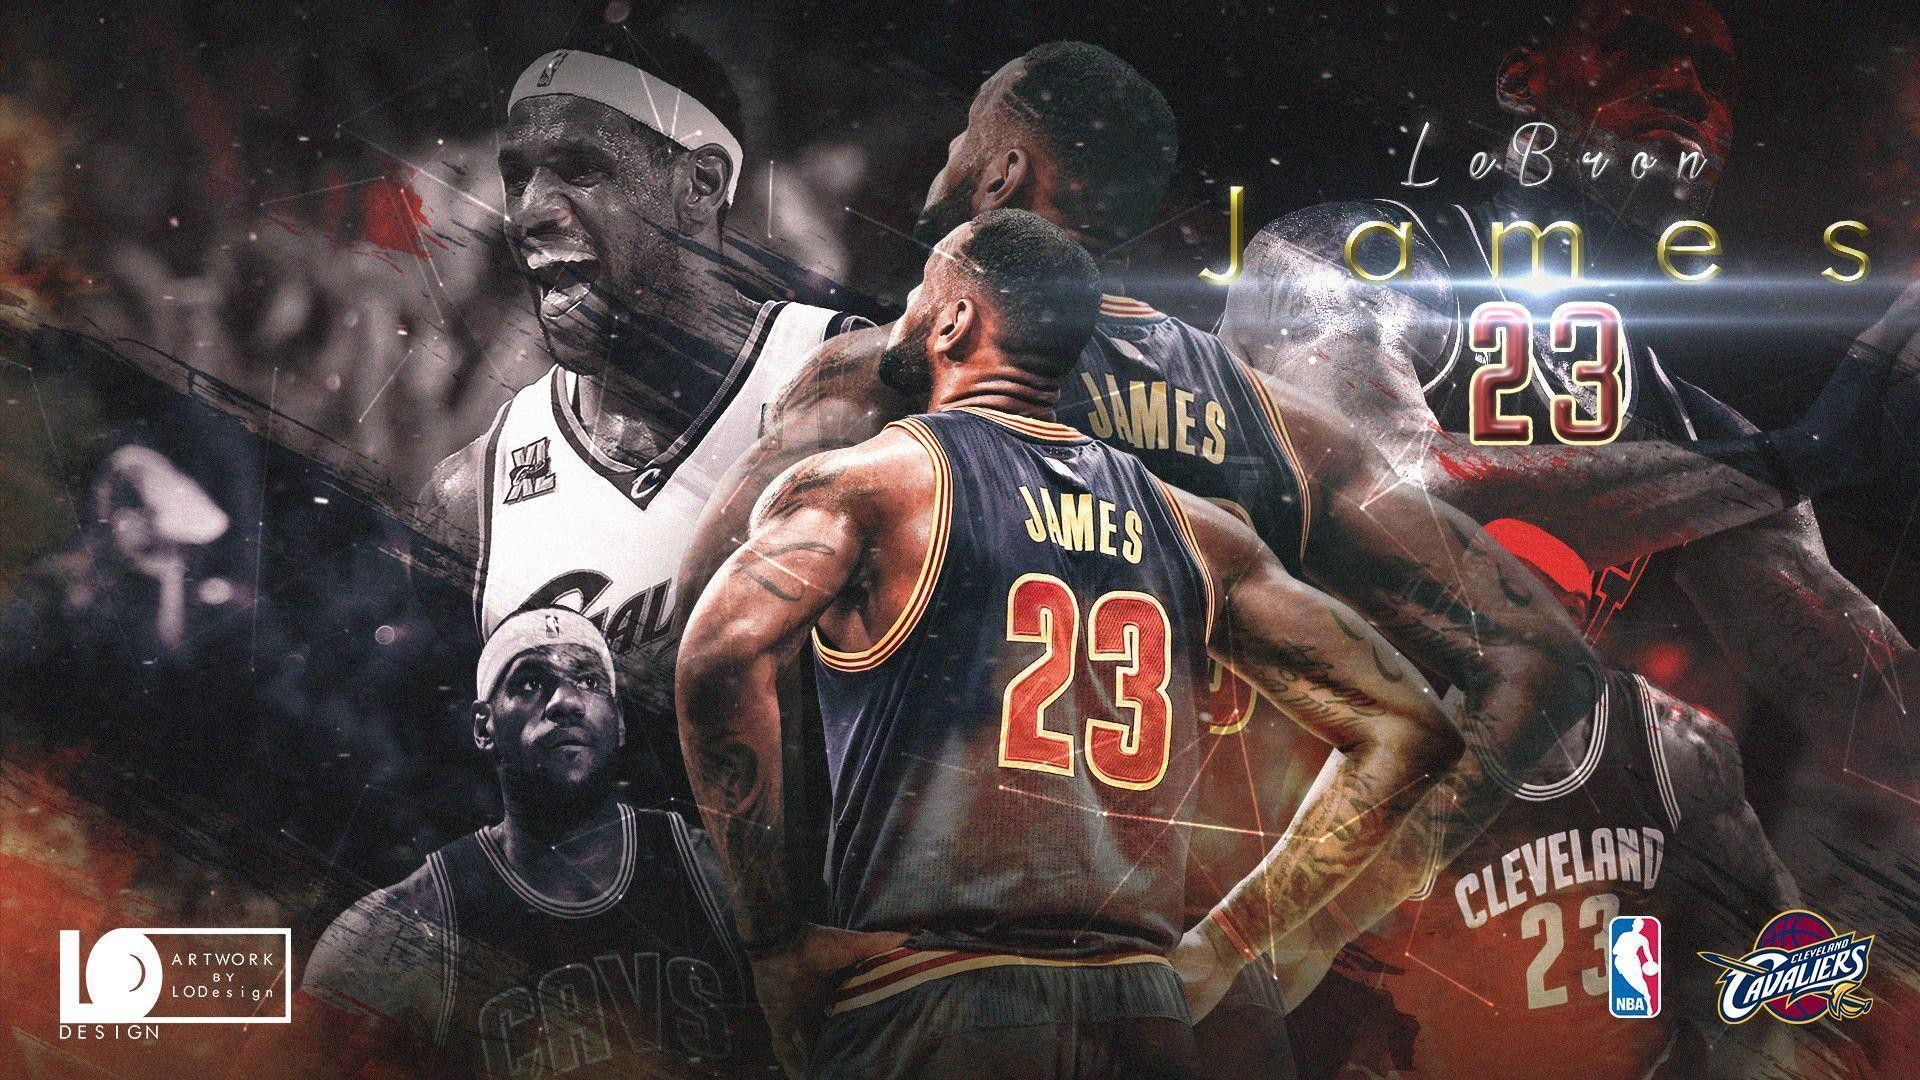 2560x1600 LeBron James Miami Heat NBA Basketball Px Wallpapers HD Desktop And Mobile Backgrounds